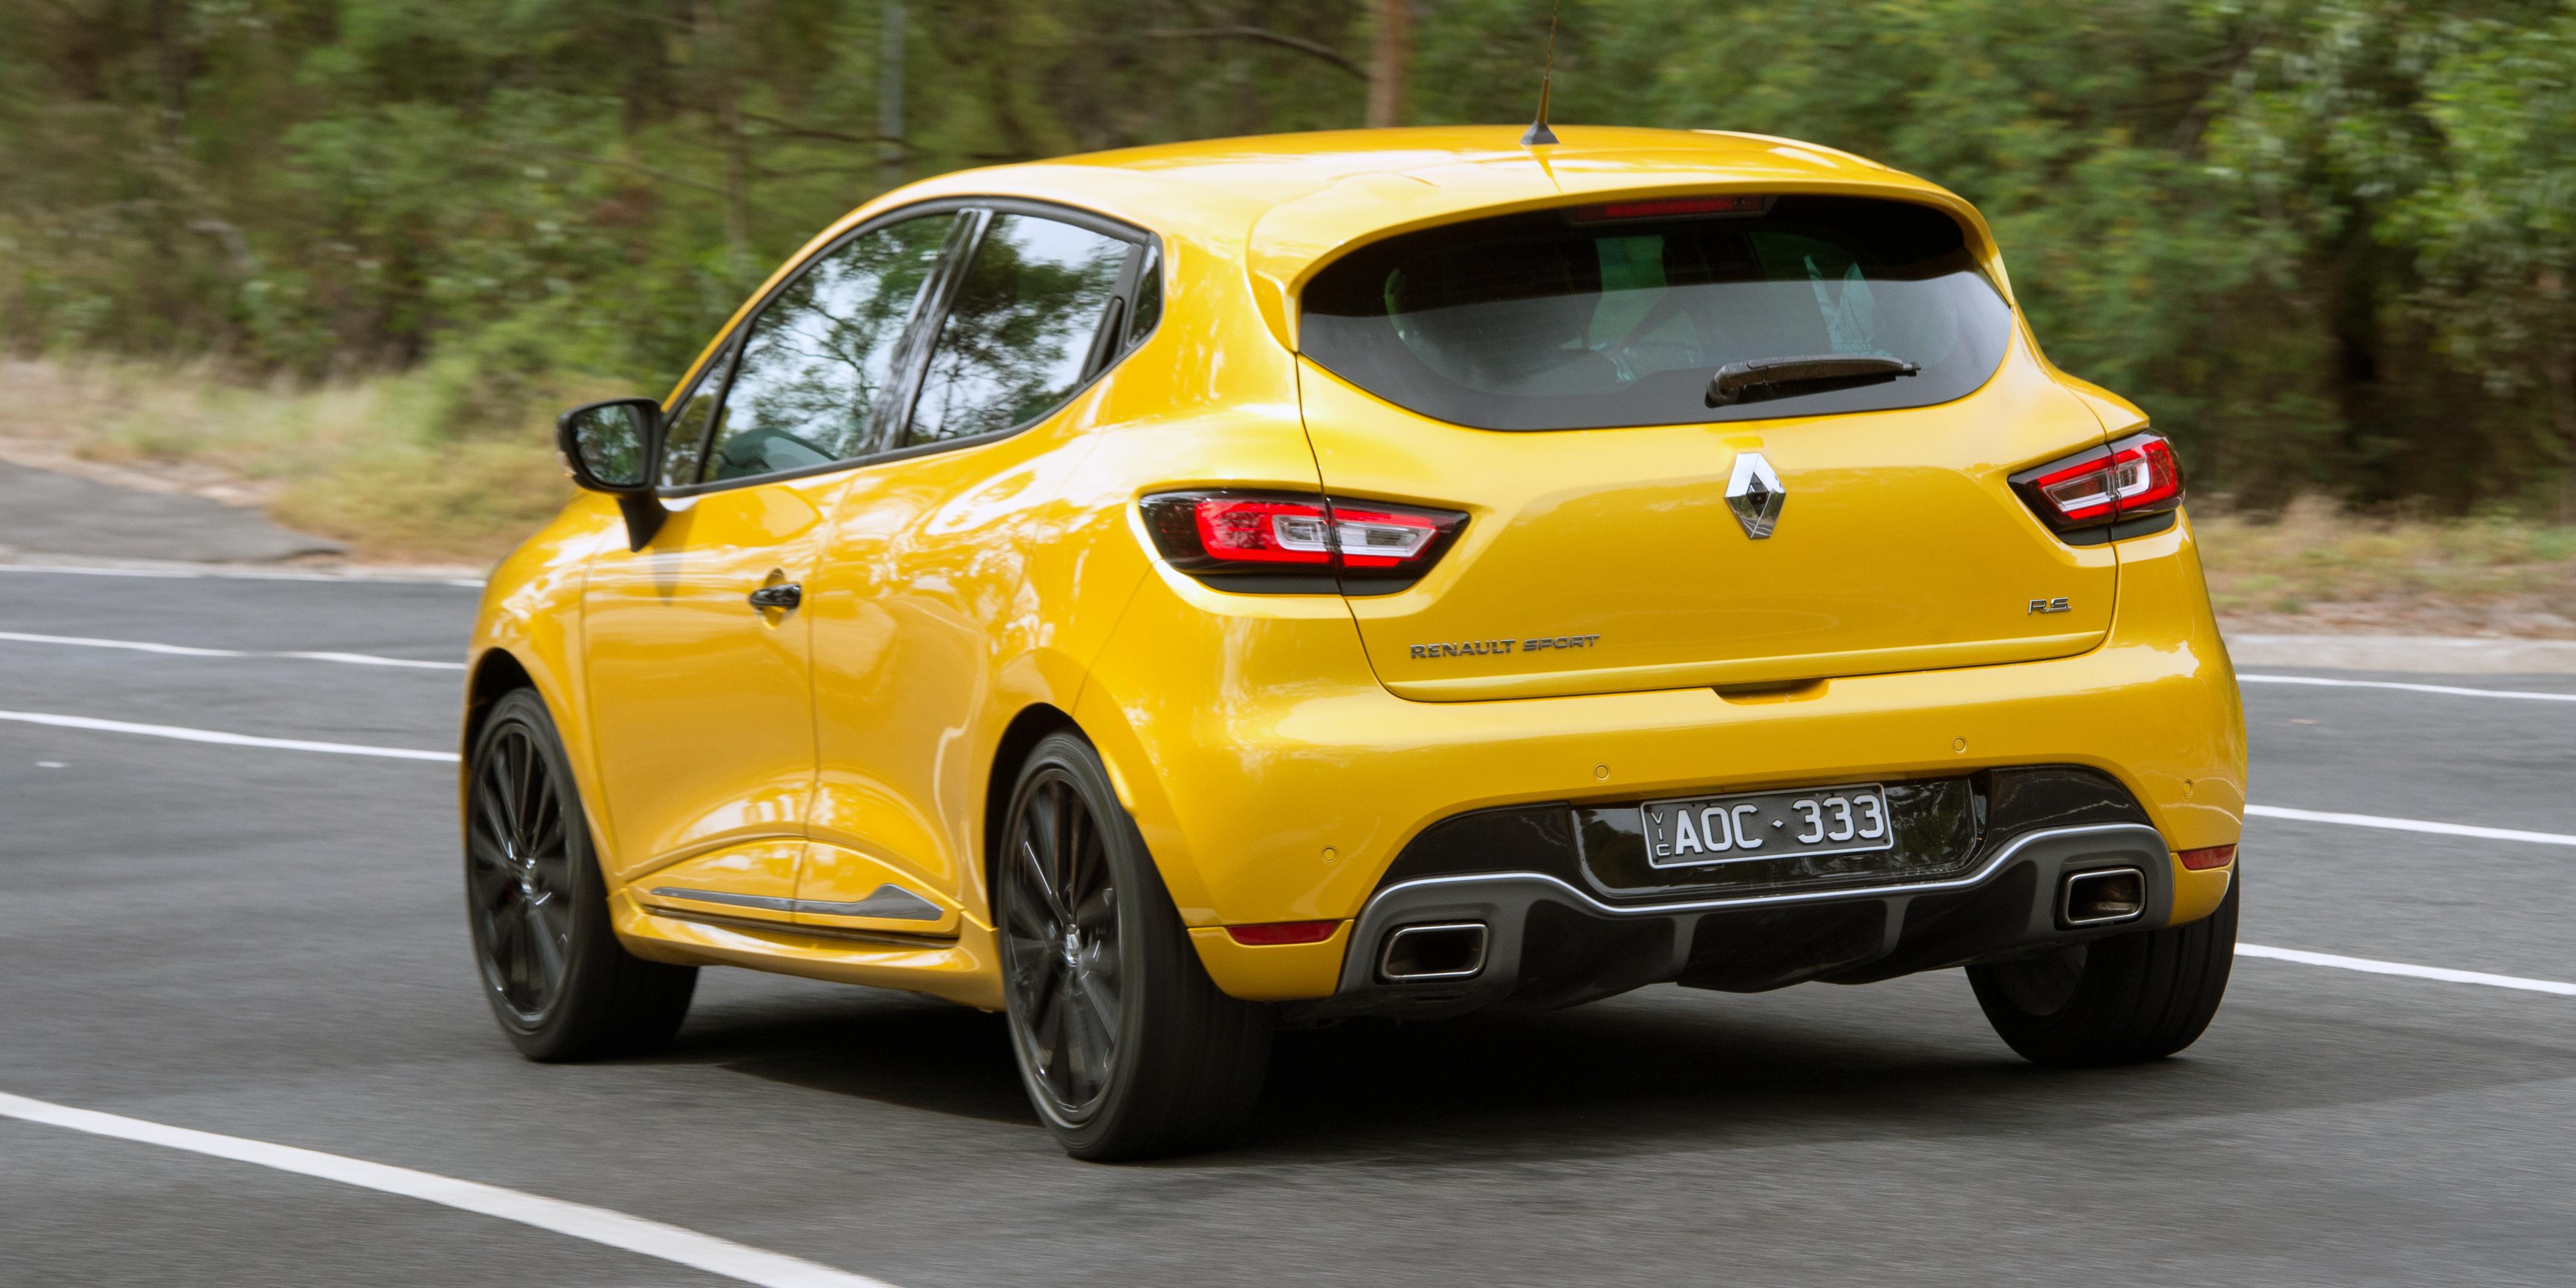 2018 Renault Clio RS Cup v Suzuki Swift Sport comparison | CarAdvice